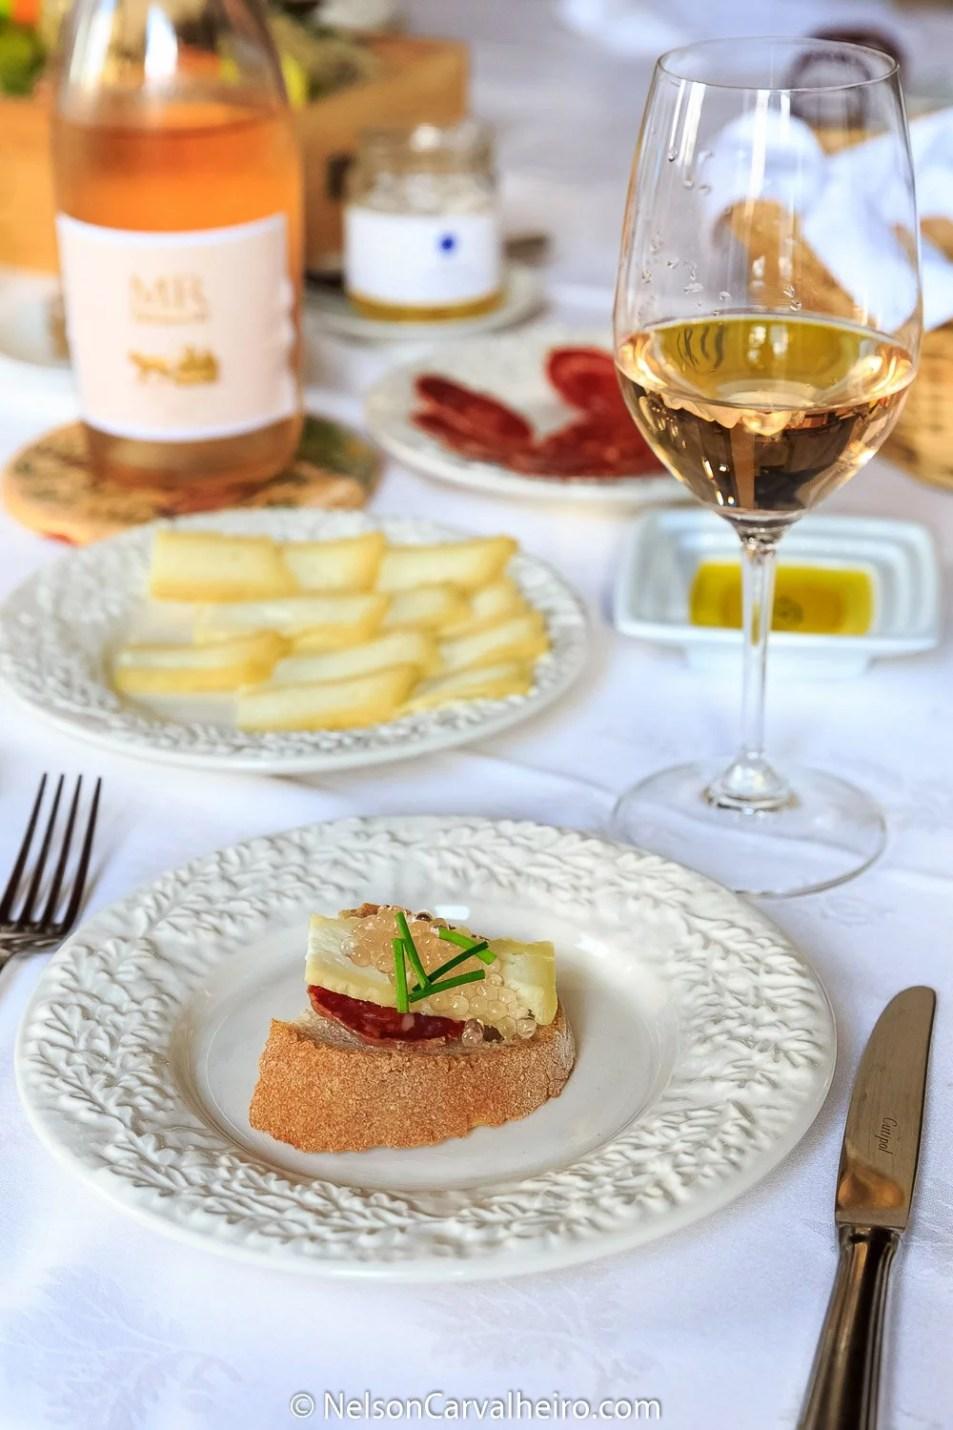 Nelson_Carvalheiro_Alentejo_Wine_Travel_Guide_Monte_Ravasqueira-8